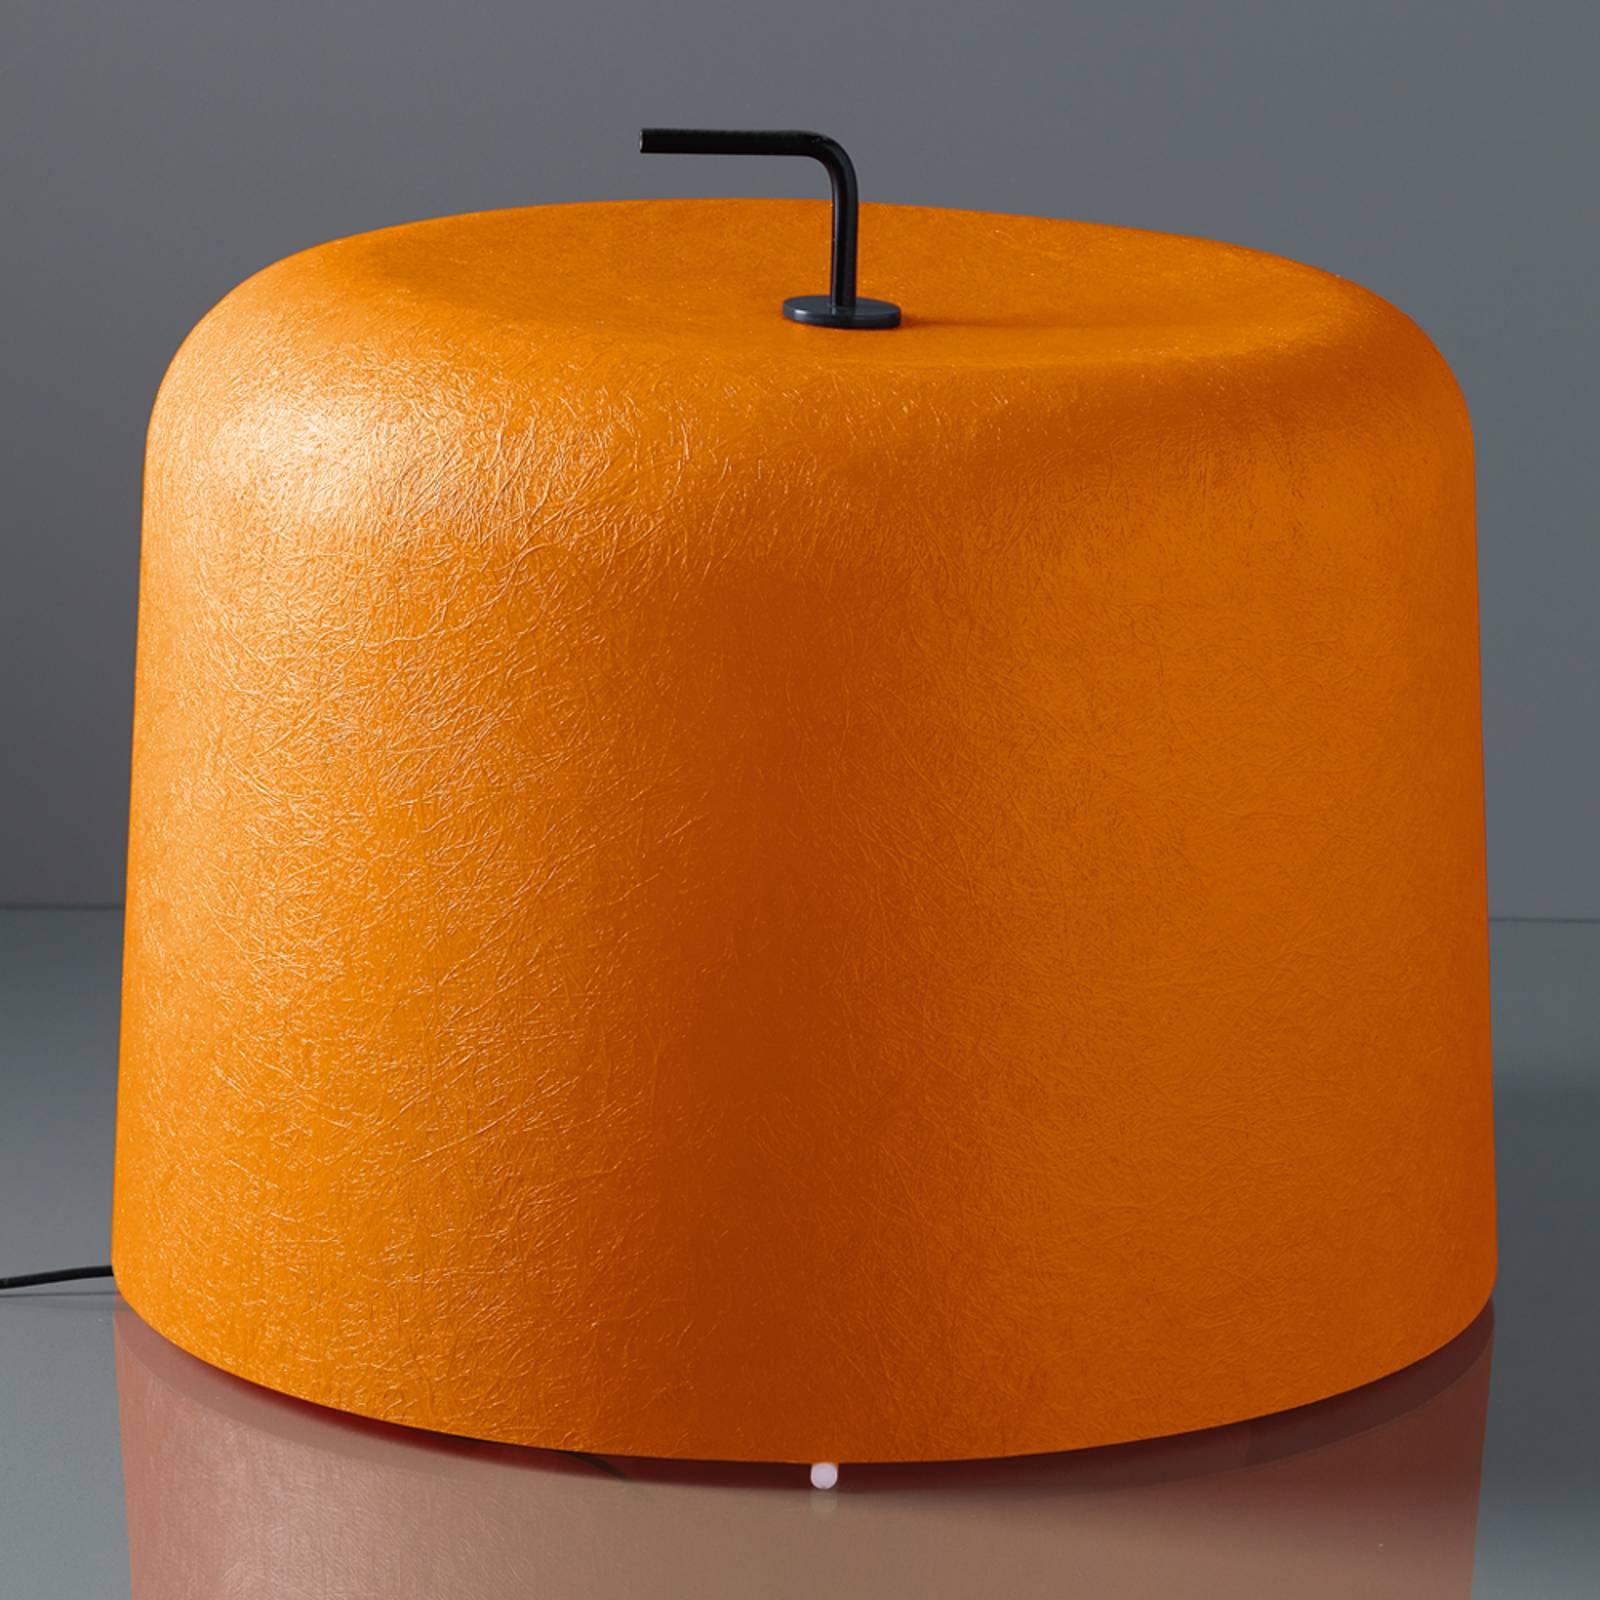 Gulvlampe Ola Move med oransje glassfiberskjerm